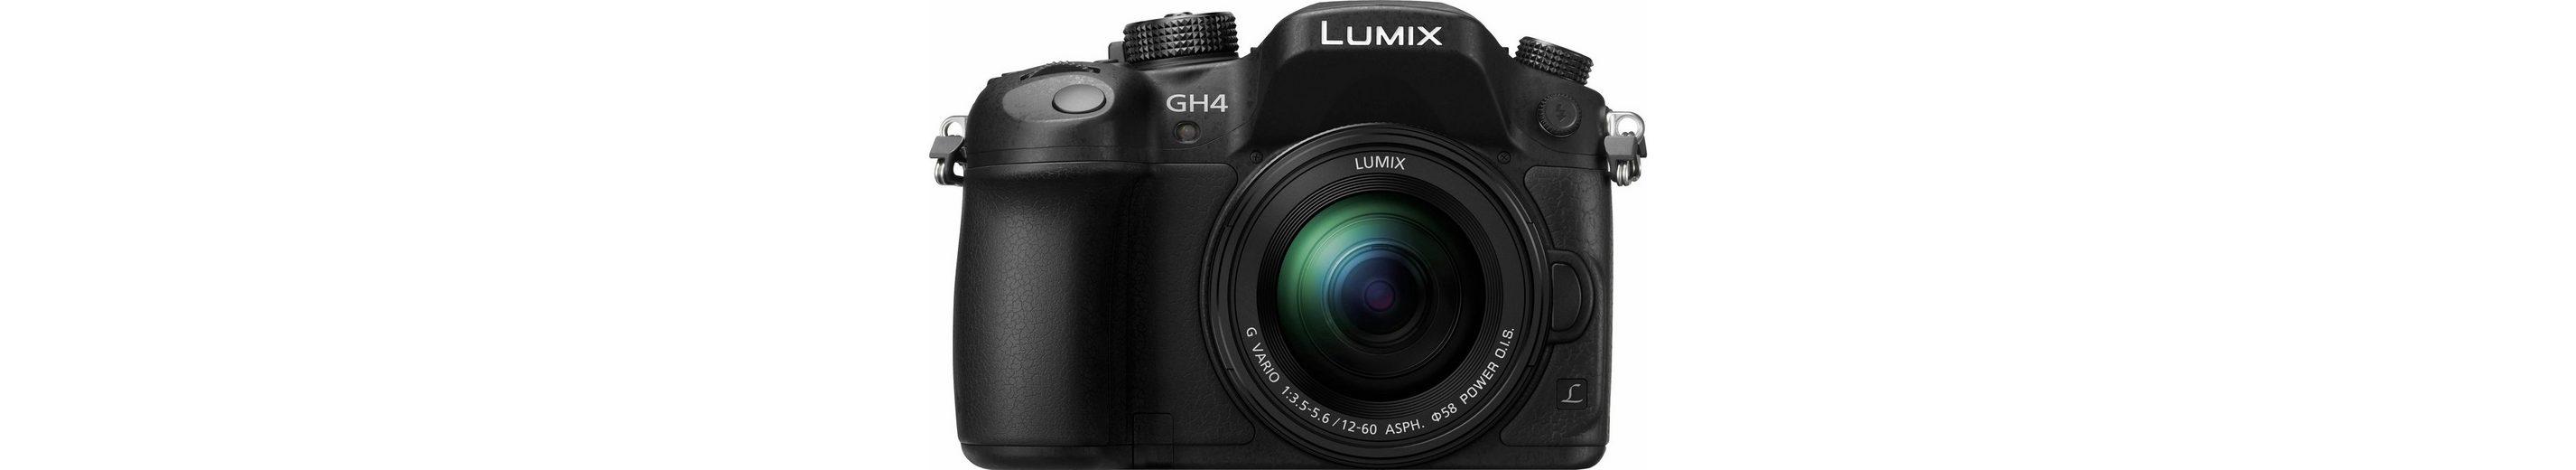 Lumix Panasonic DMC-GH4MEG-K System Kamera, H-FS12060 Zoom, 16 Megapixel, 7,5 cm (3 Zoll) Display